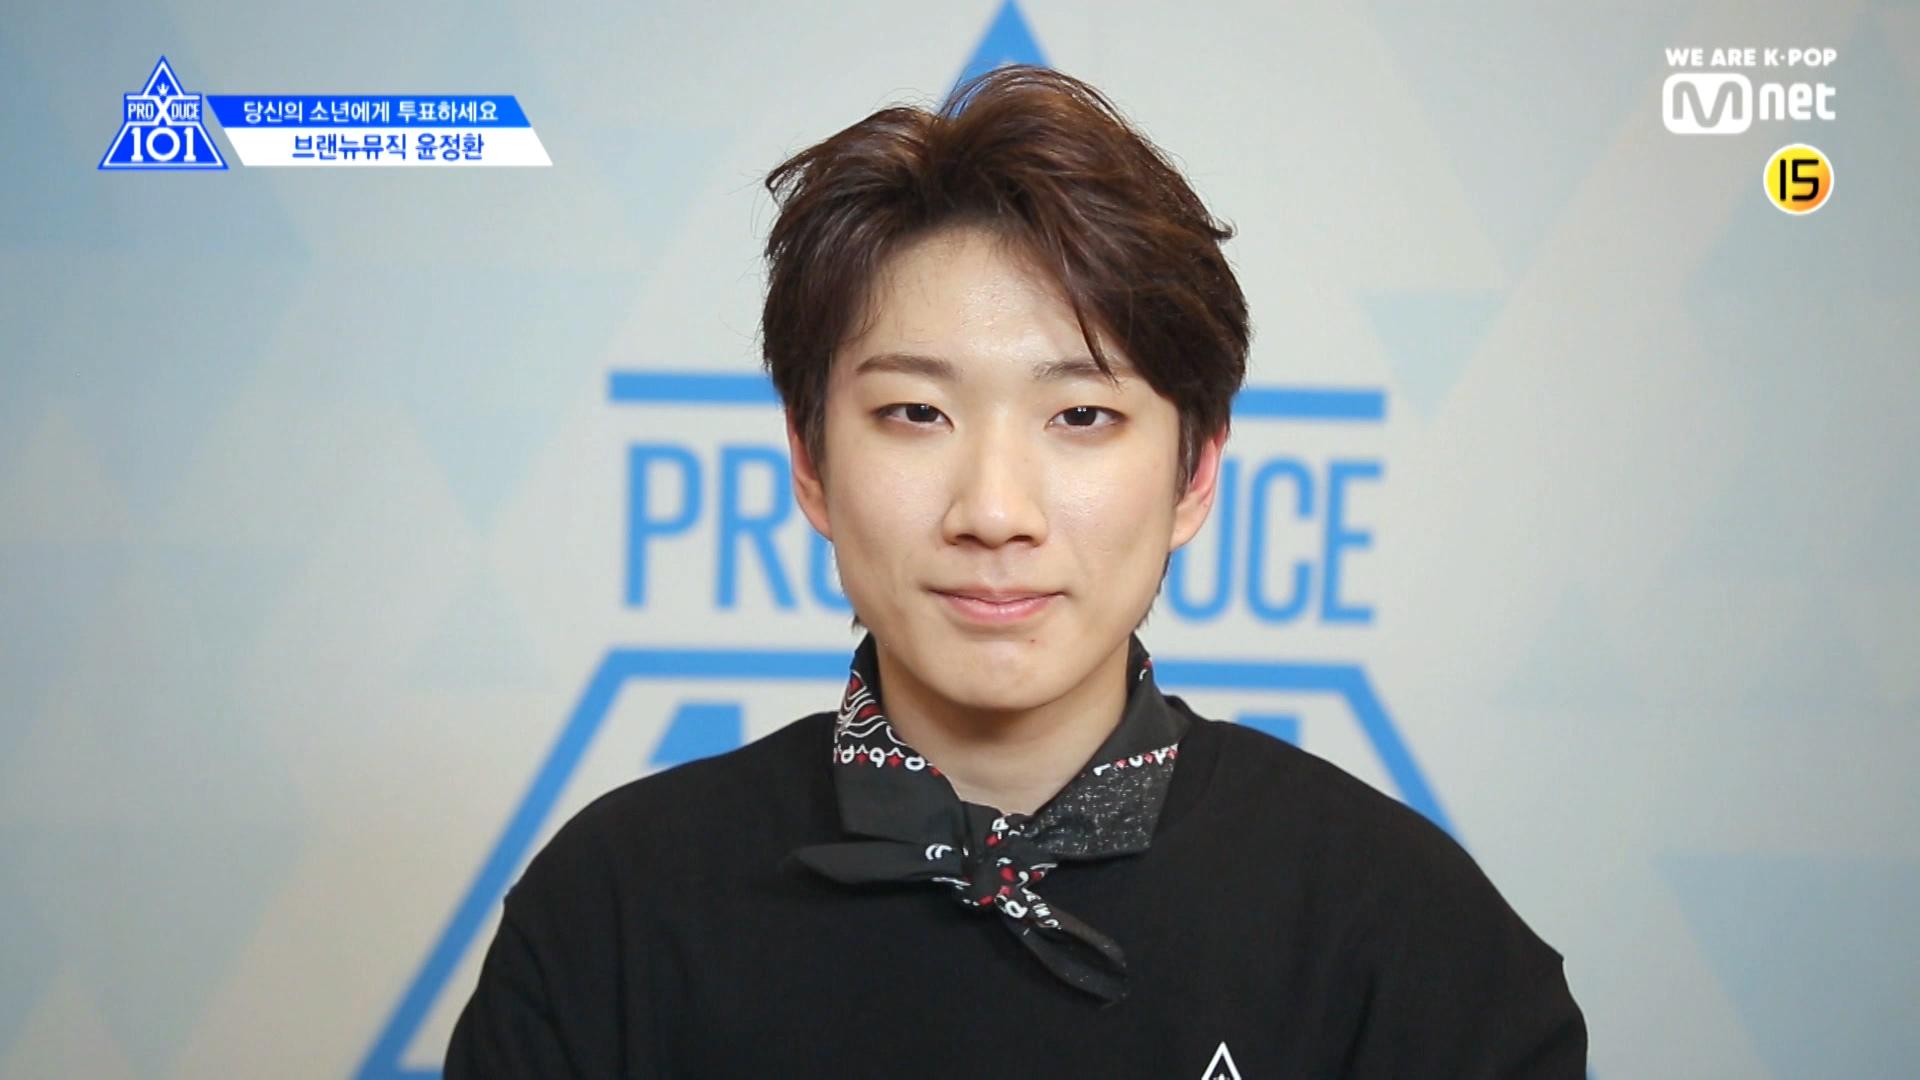 [PRODUCE X 101] EYE CONTACT CHALLENGE l YUN JUNG HWAN(BRANDNEW MUSIC)